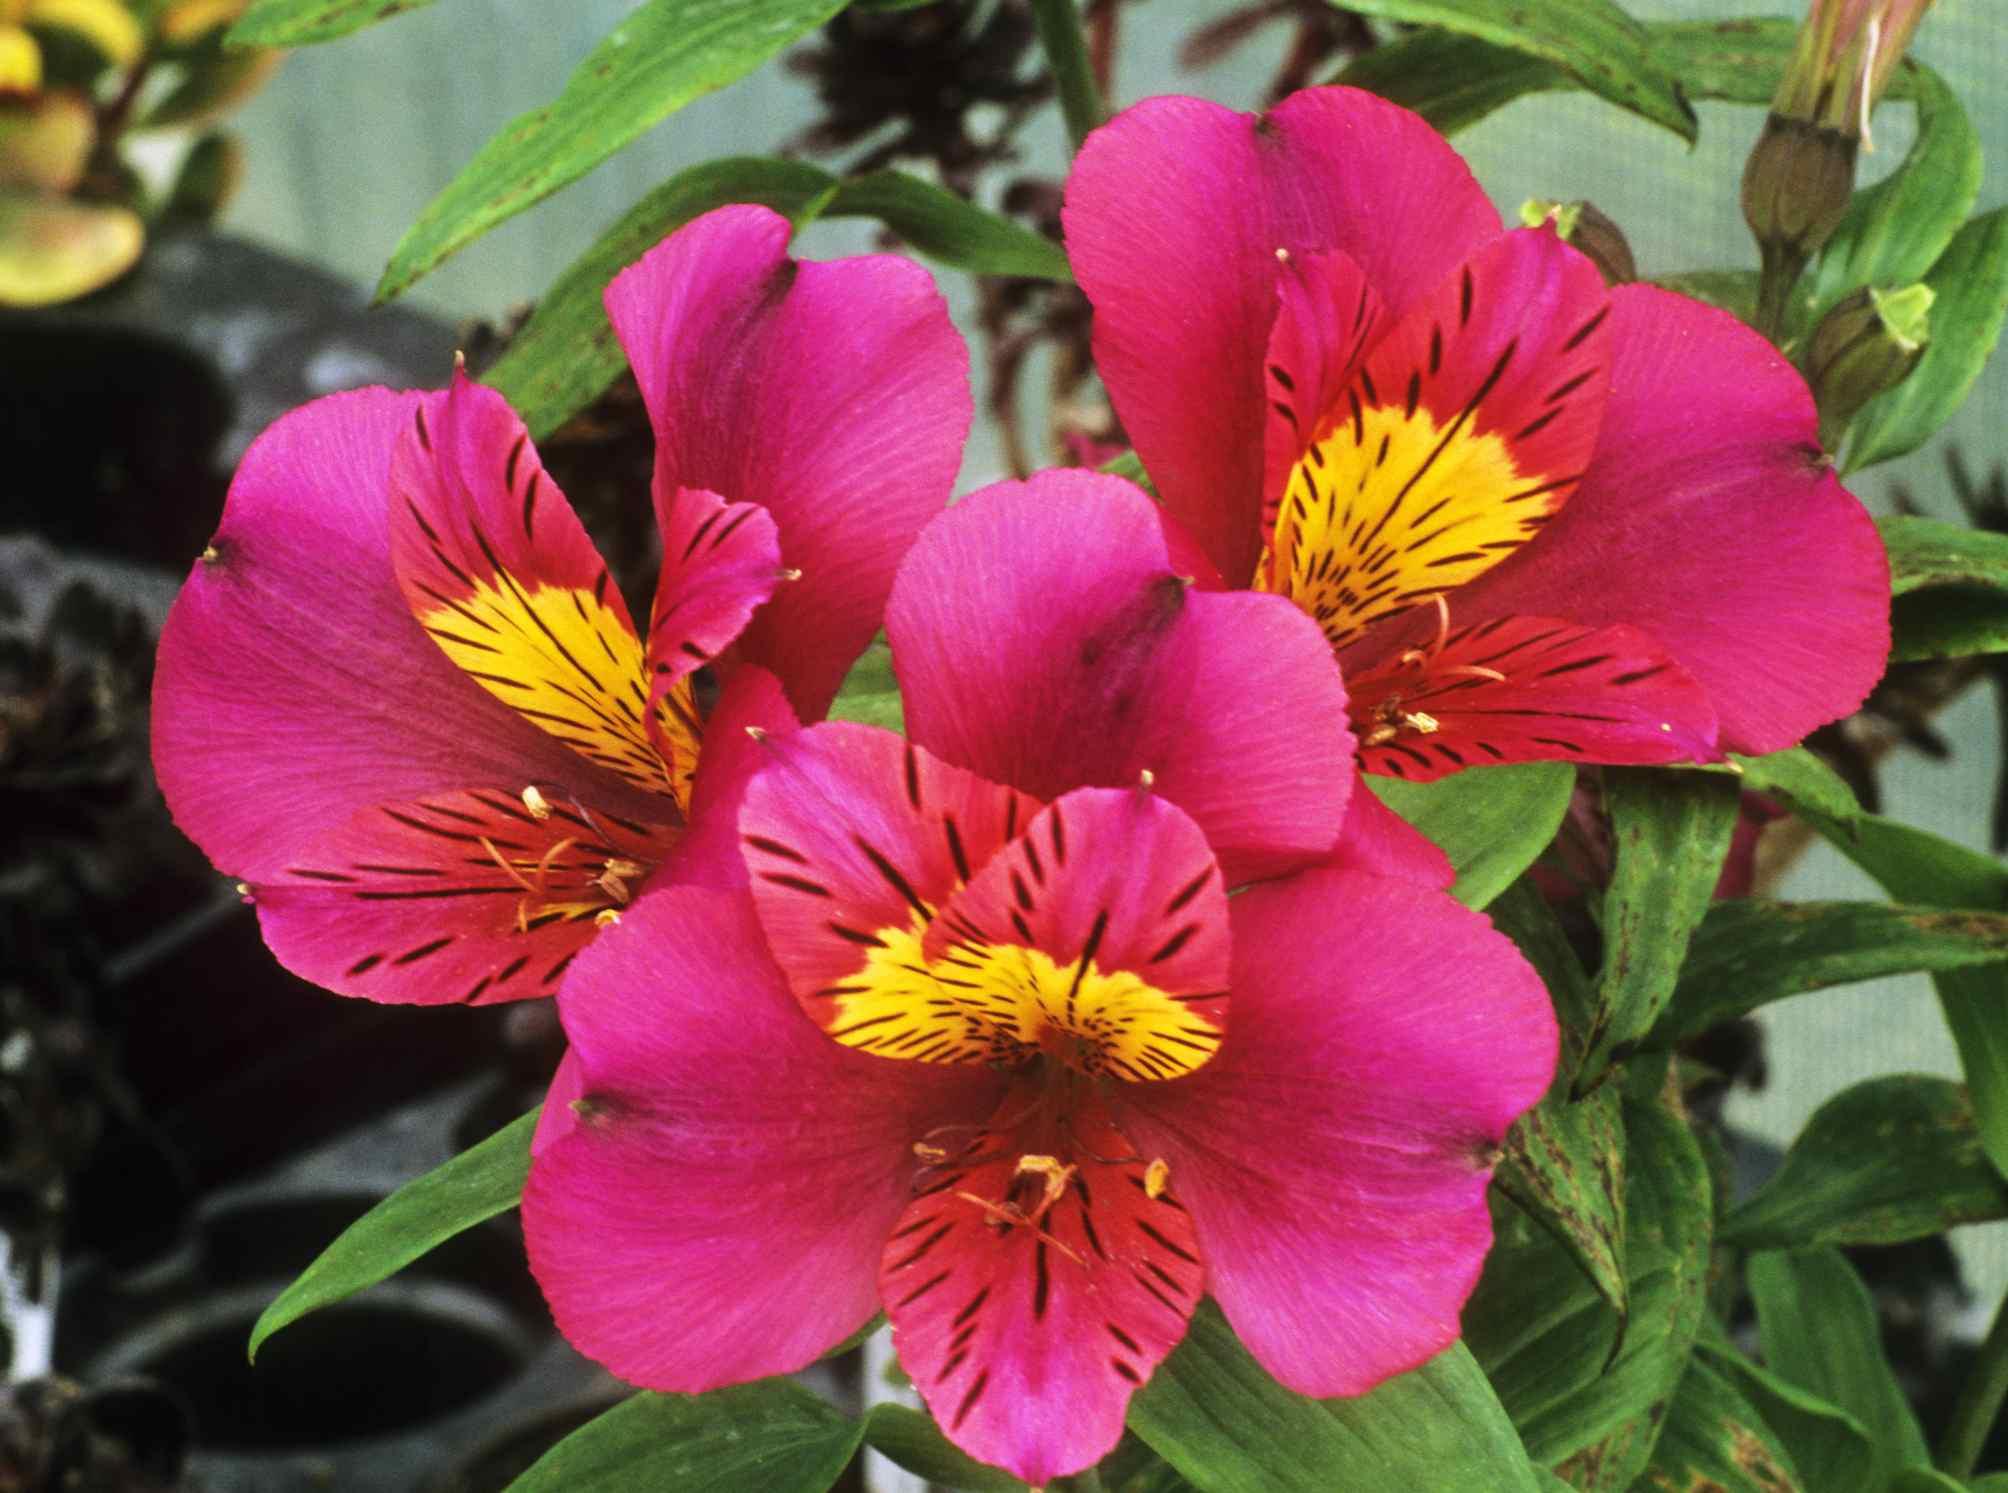 'Adonis' Peruvian Lily